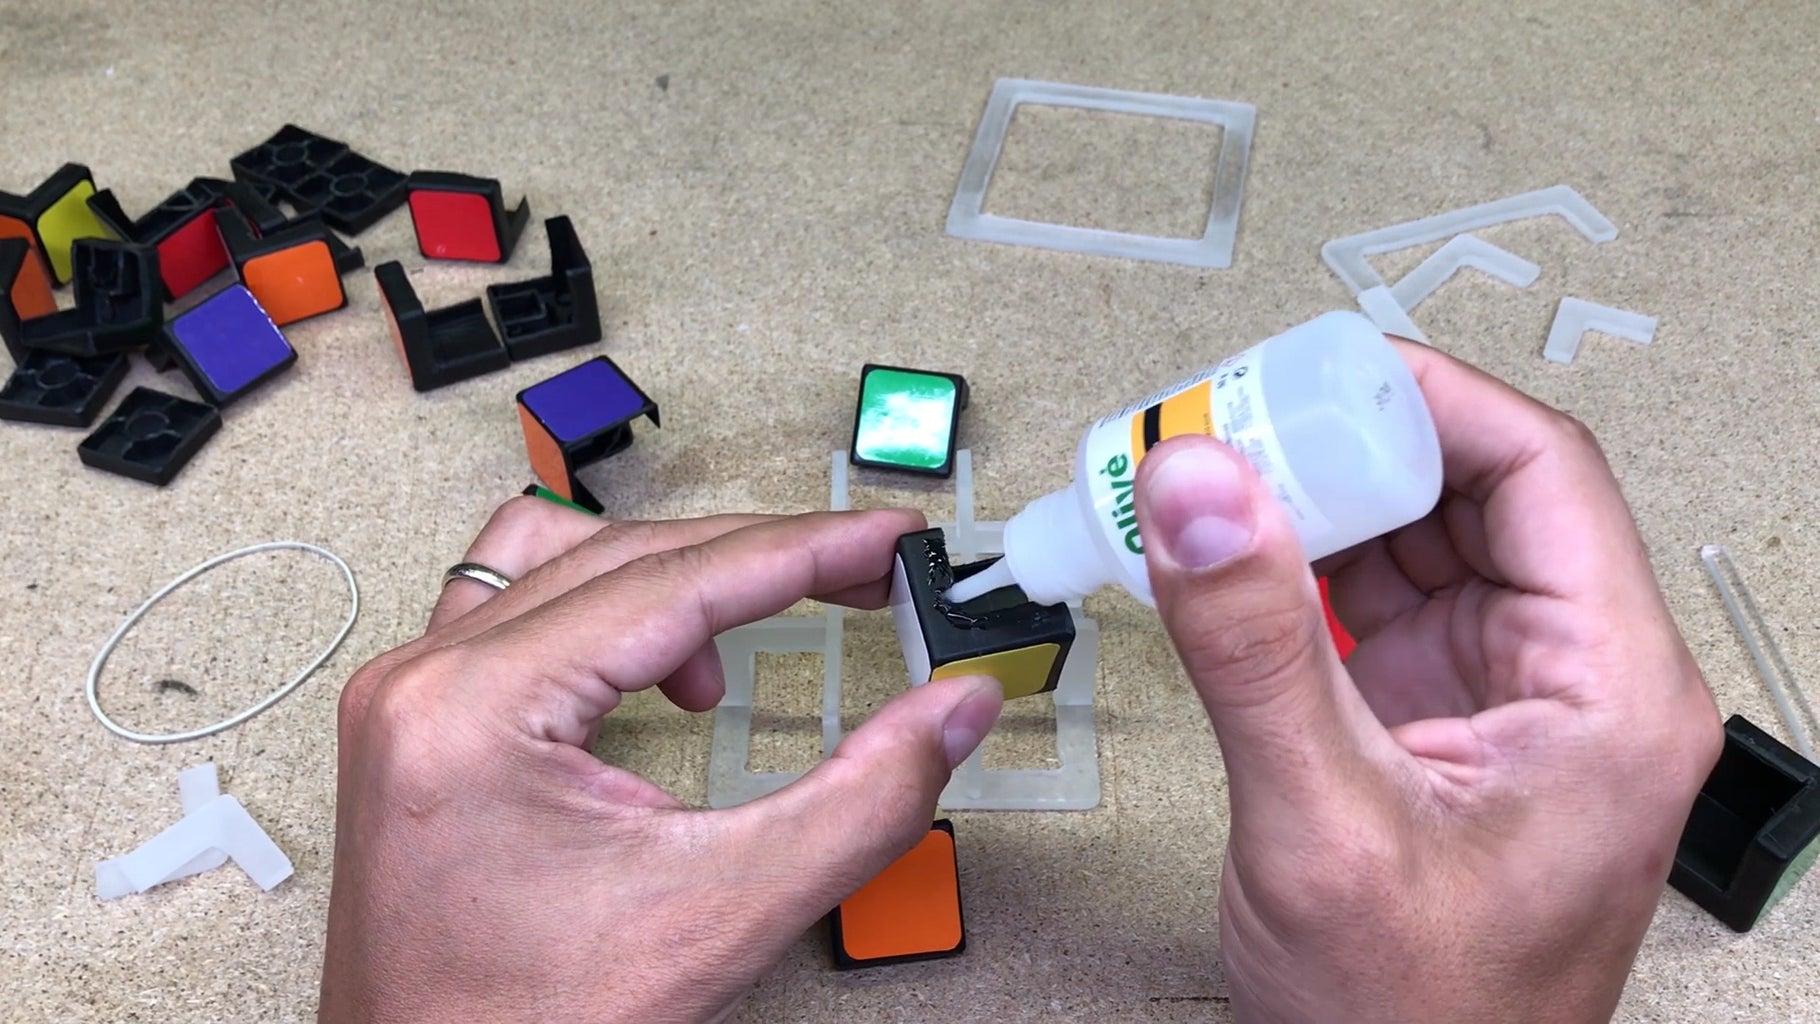 Assembling Small Cubes